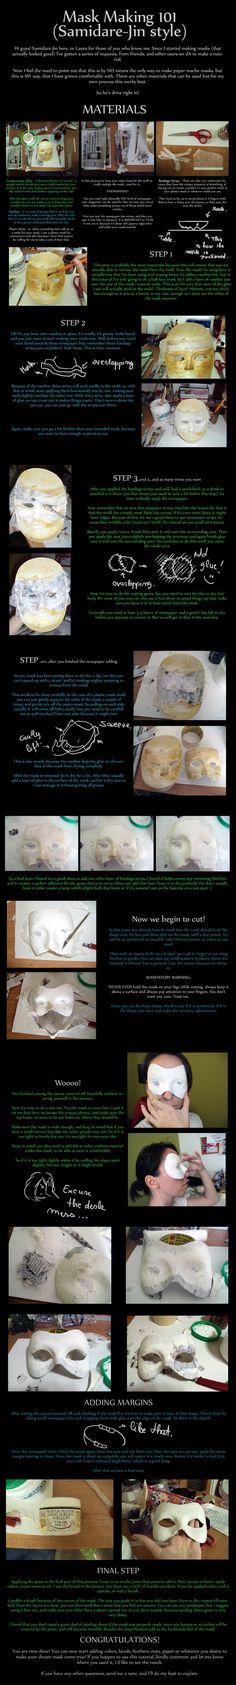 Mask Making Tutorial by Samidare-Jin.deviantart.com on @deviantART